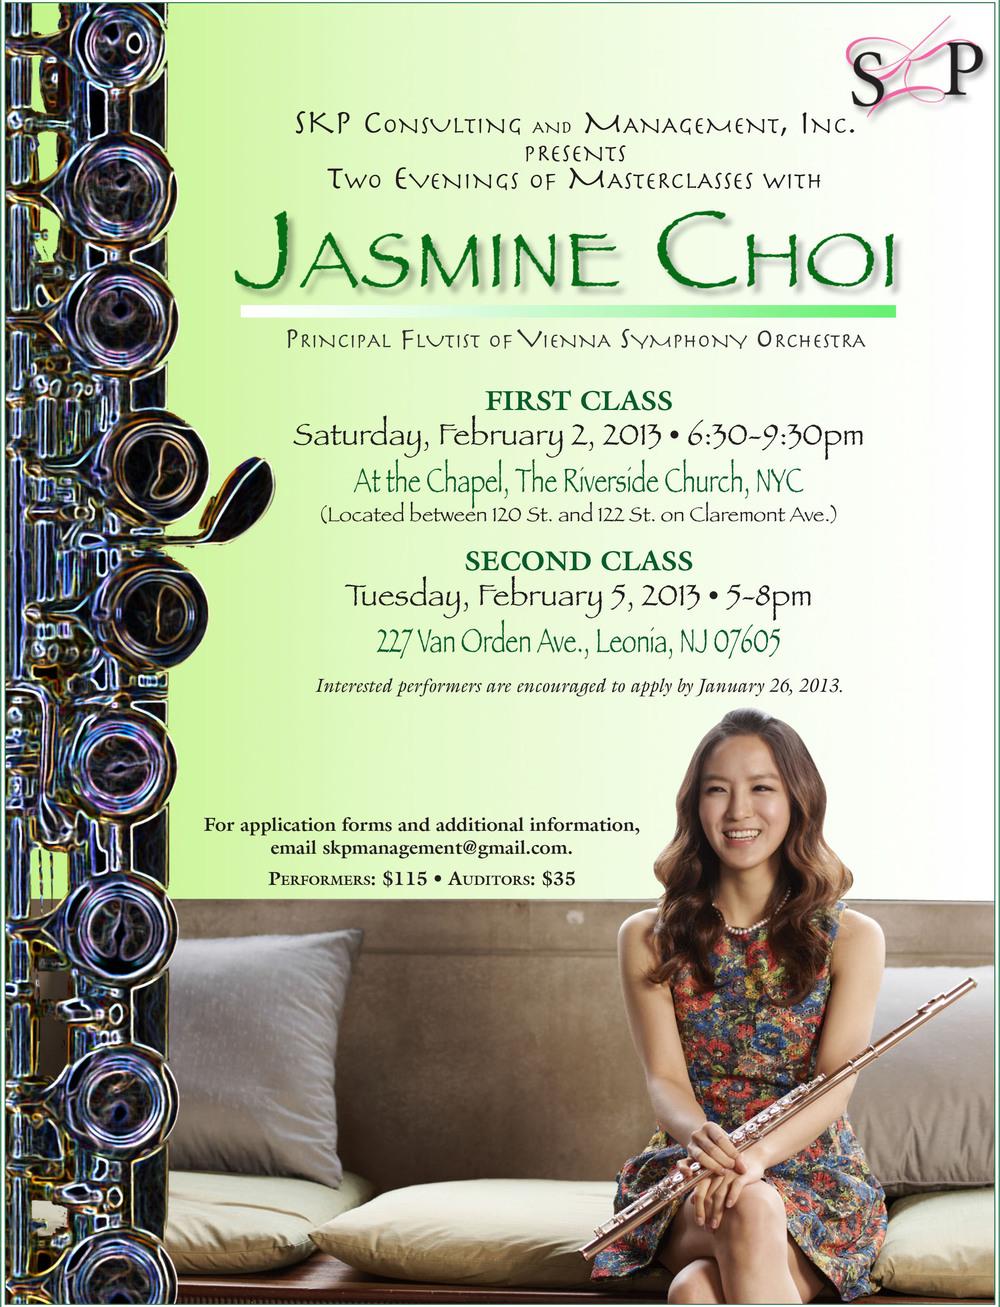 Jasmine Choi Flyer01.jpg